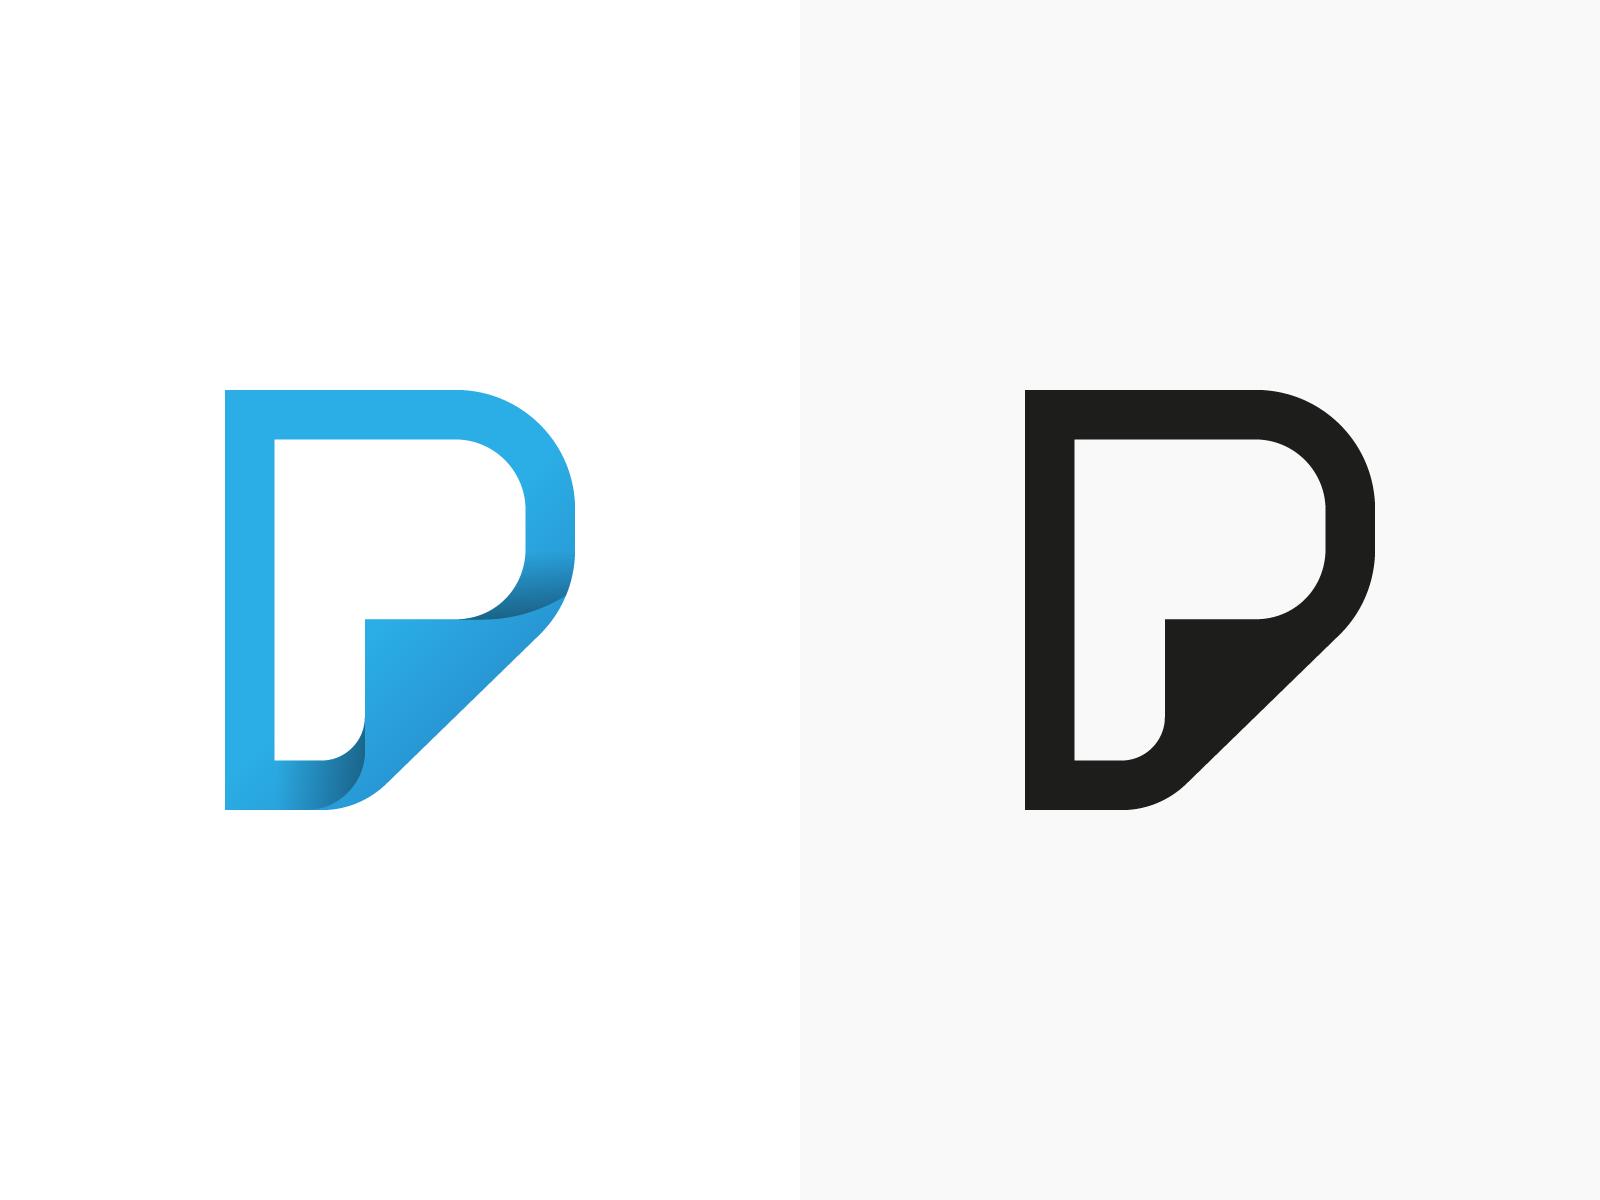 P page monogram